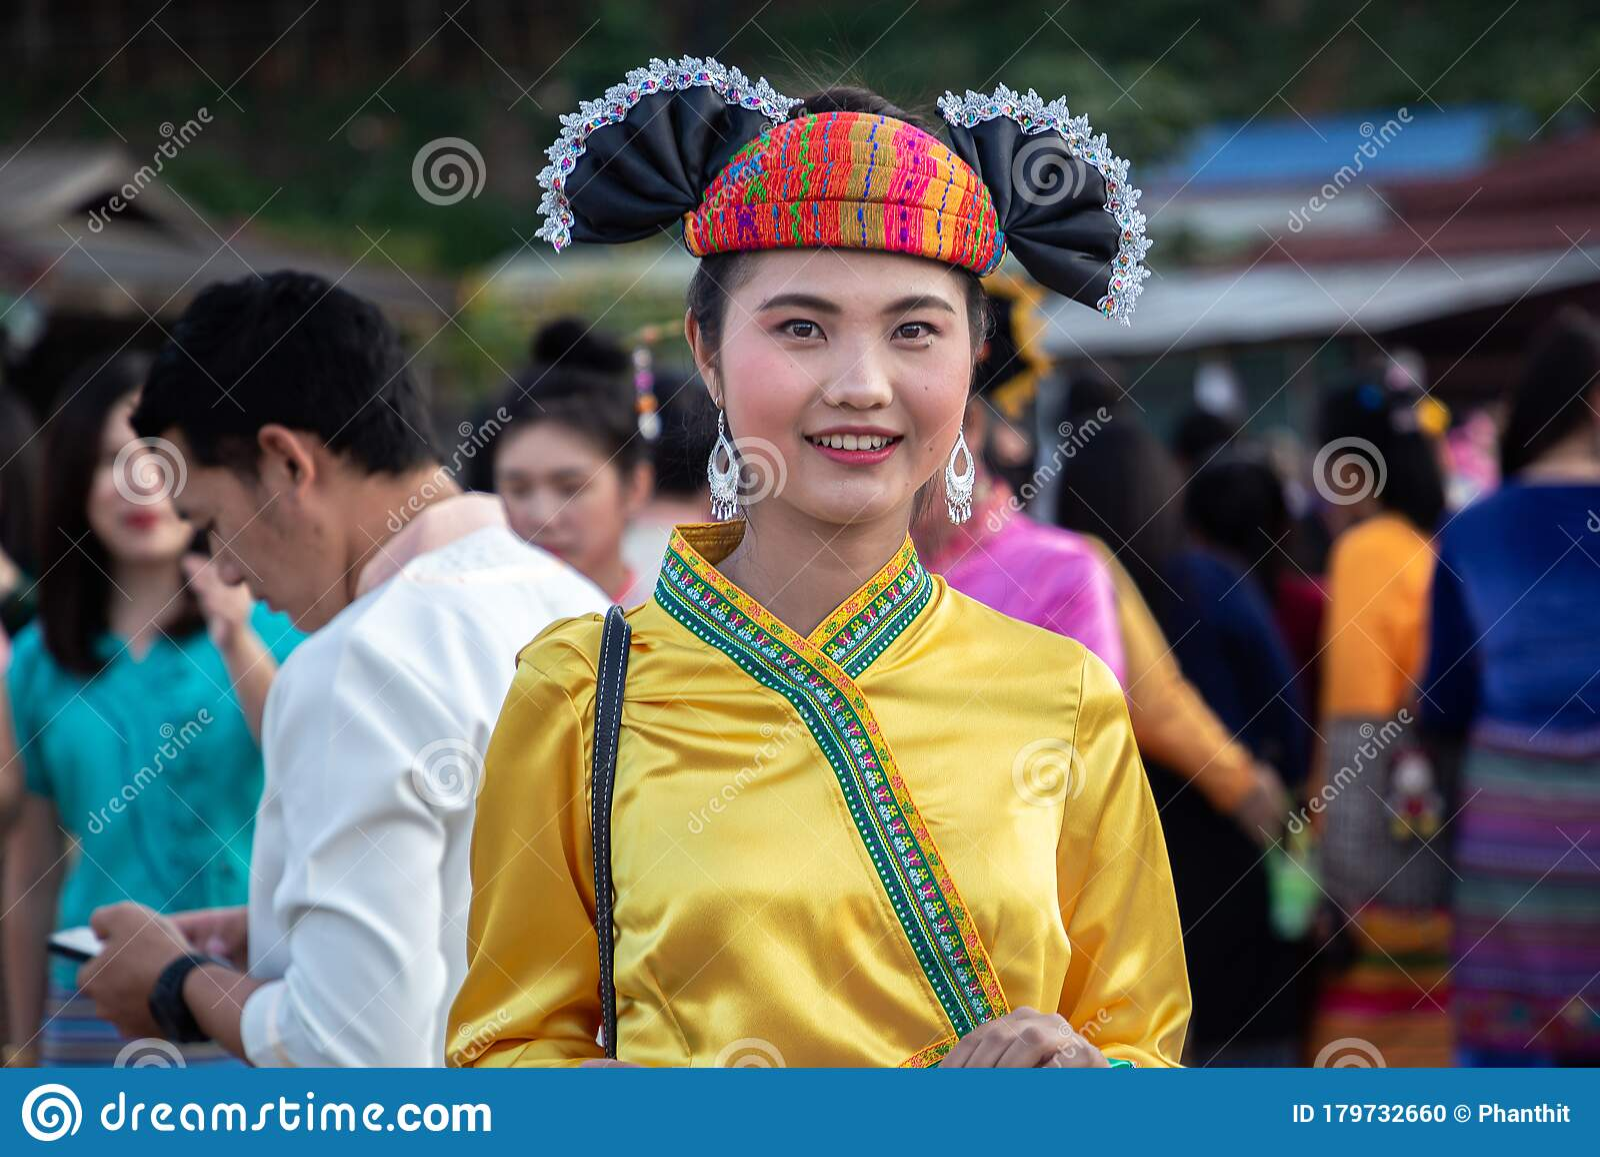 https://thumbs.dreamstime.com/z/thoet-thai-chiang-rai-thailand-november-beauty-woman-shan-tai-yai-ethnic-group-living-parts-myanmar-thailand-179732660.jpg